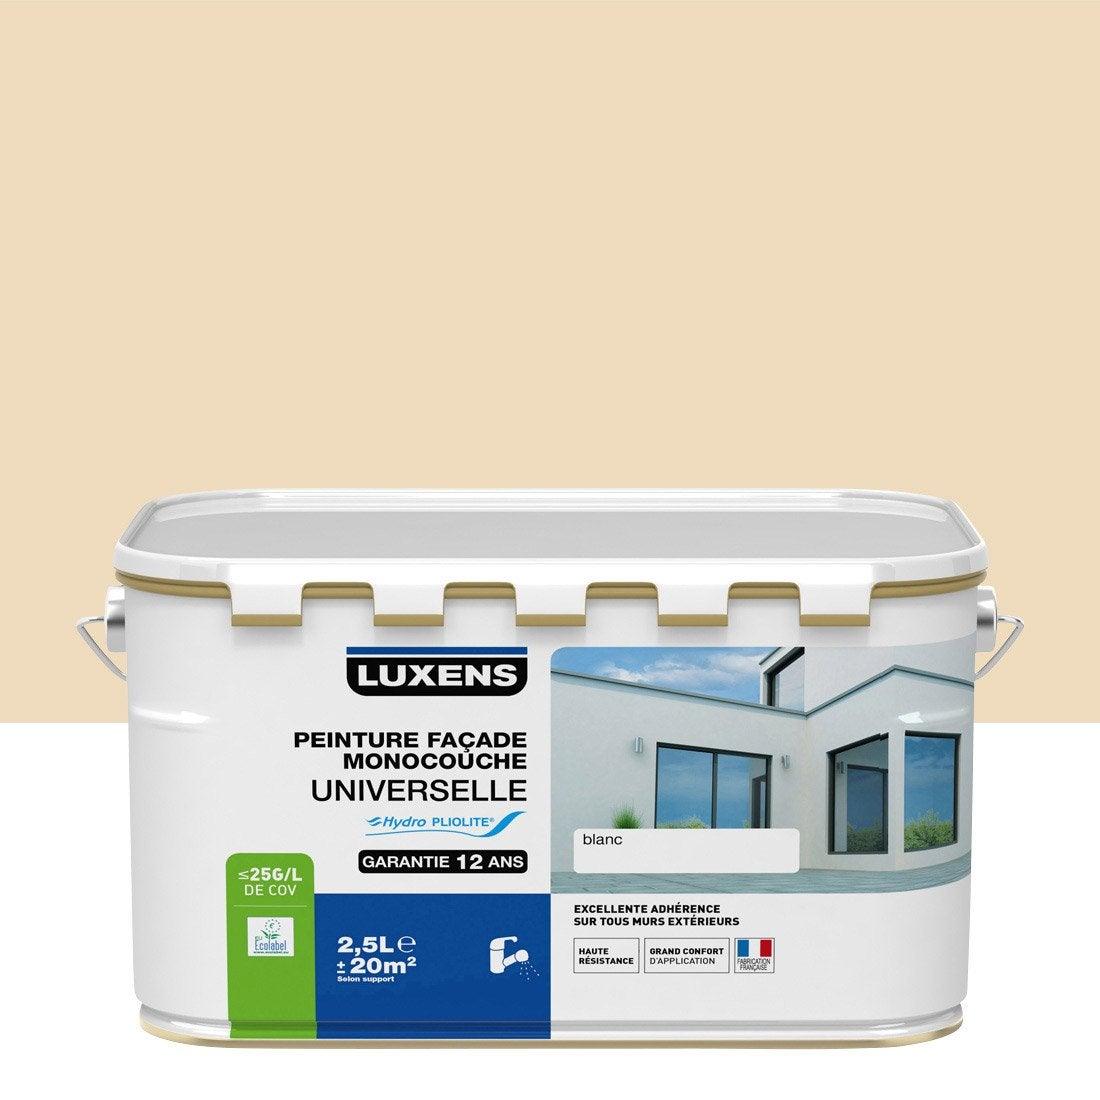 Peinture fa ade universelle luxens sable 2 5 l leroy - Peinture facade maison leroy merlin ...